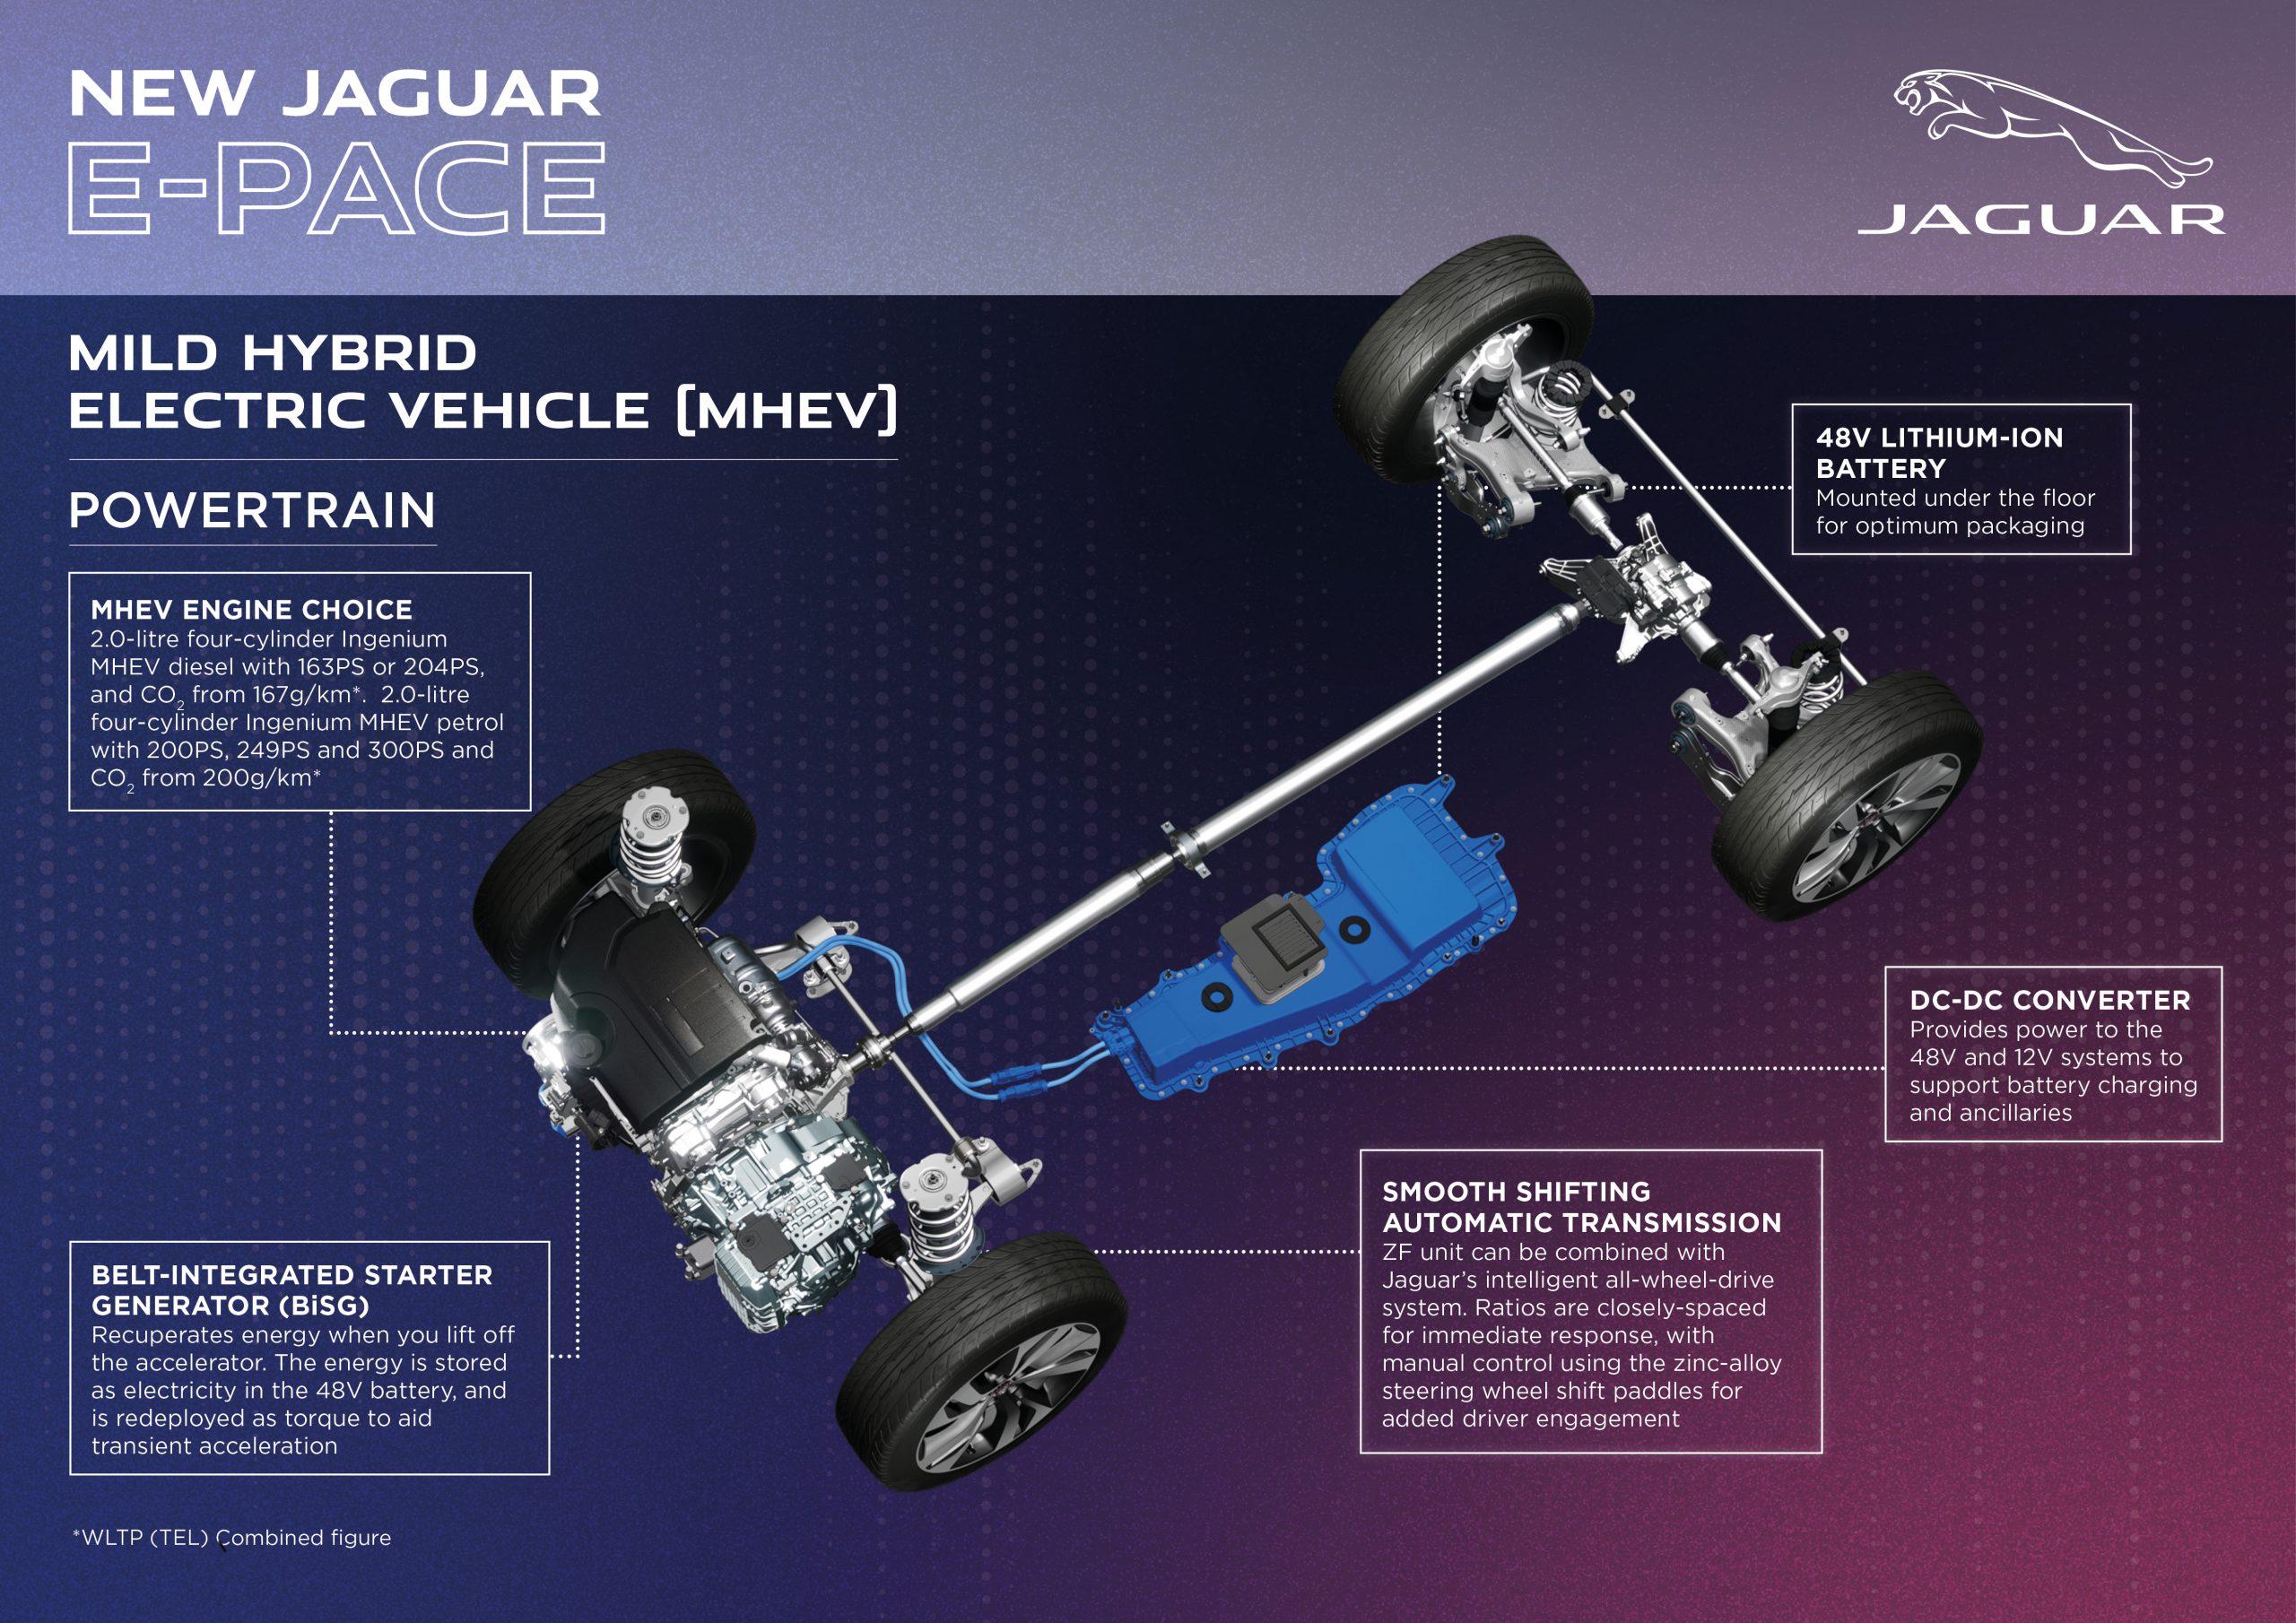 jaguar e-pace MHEV